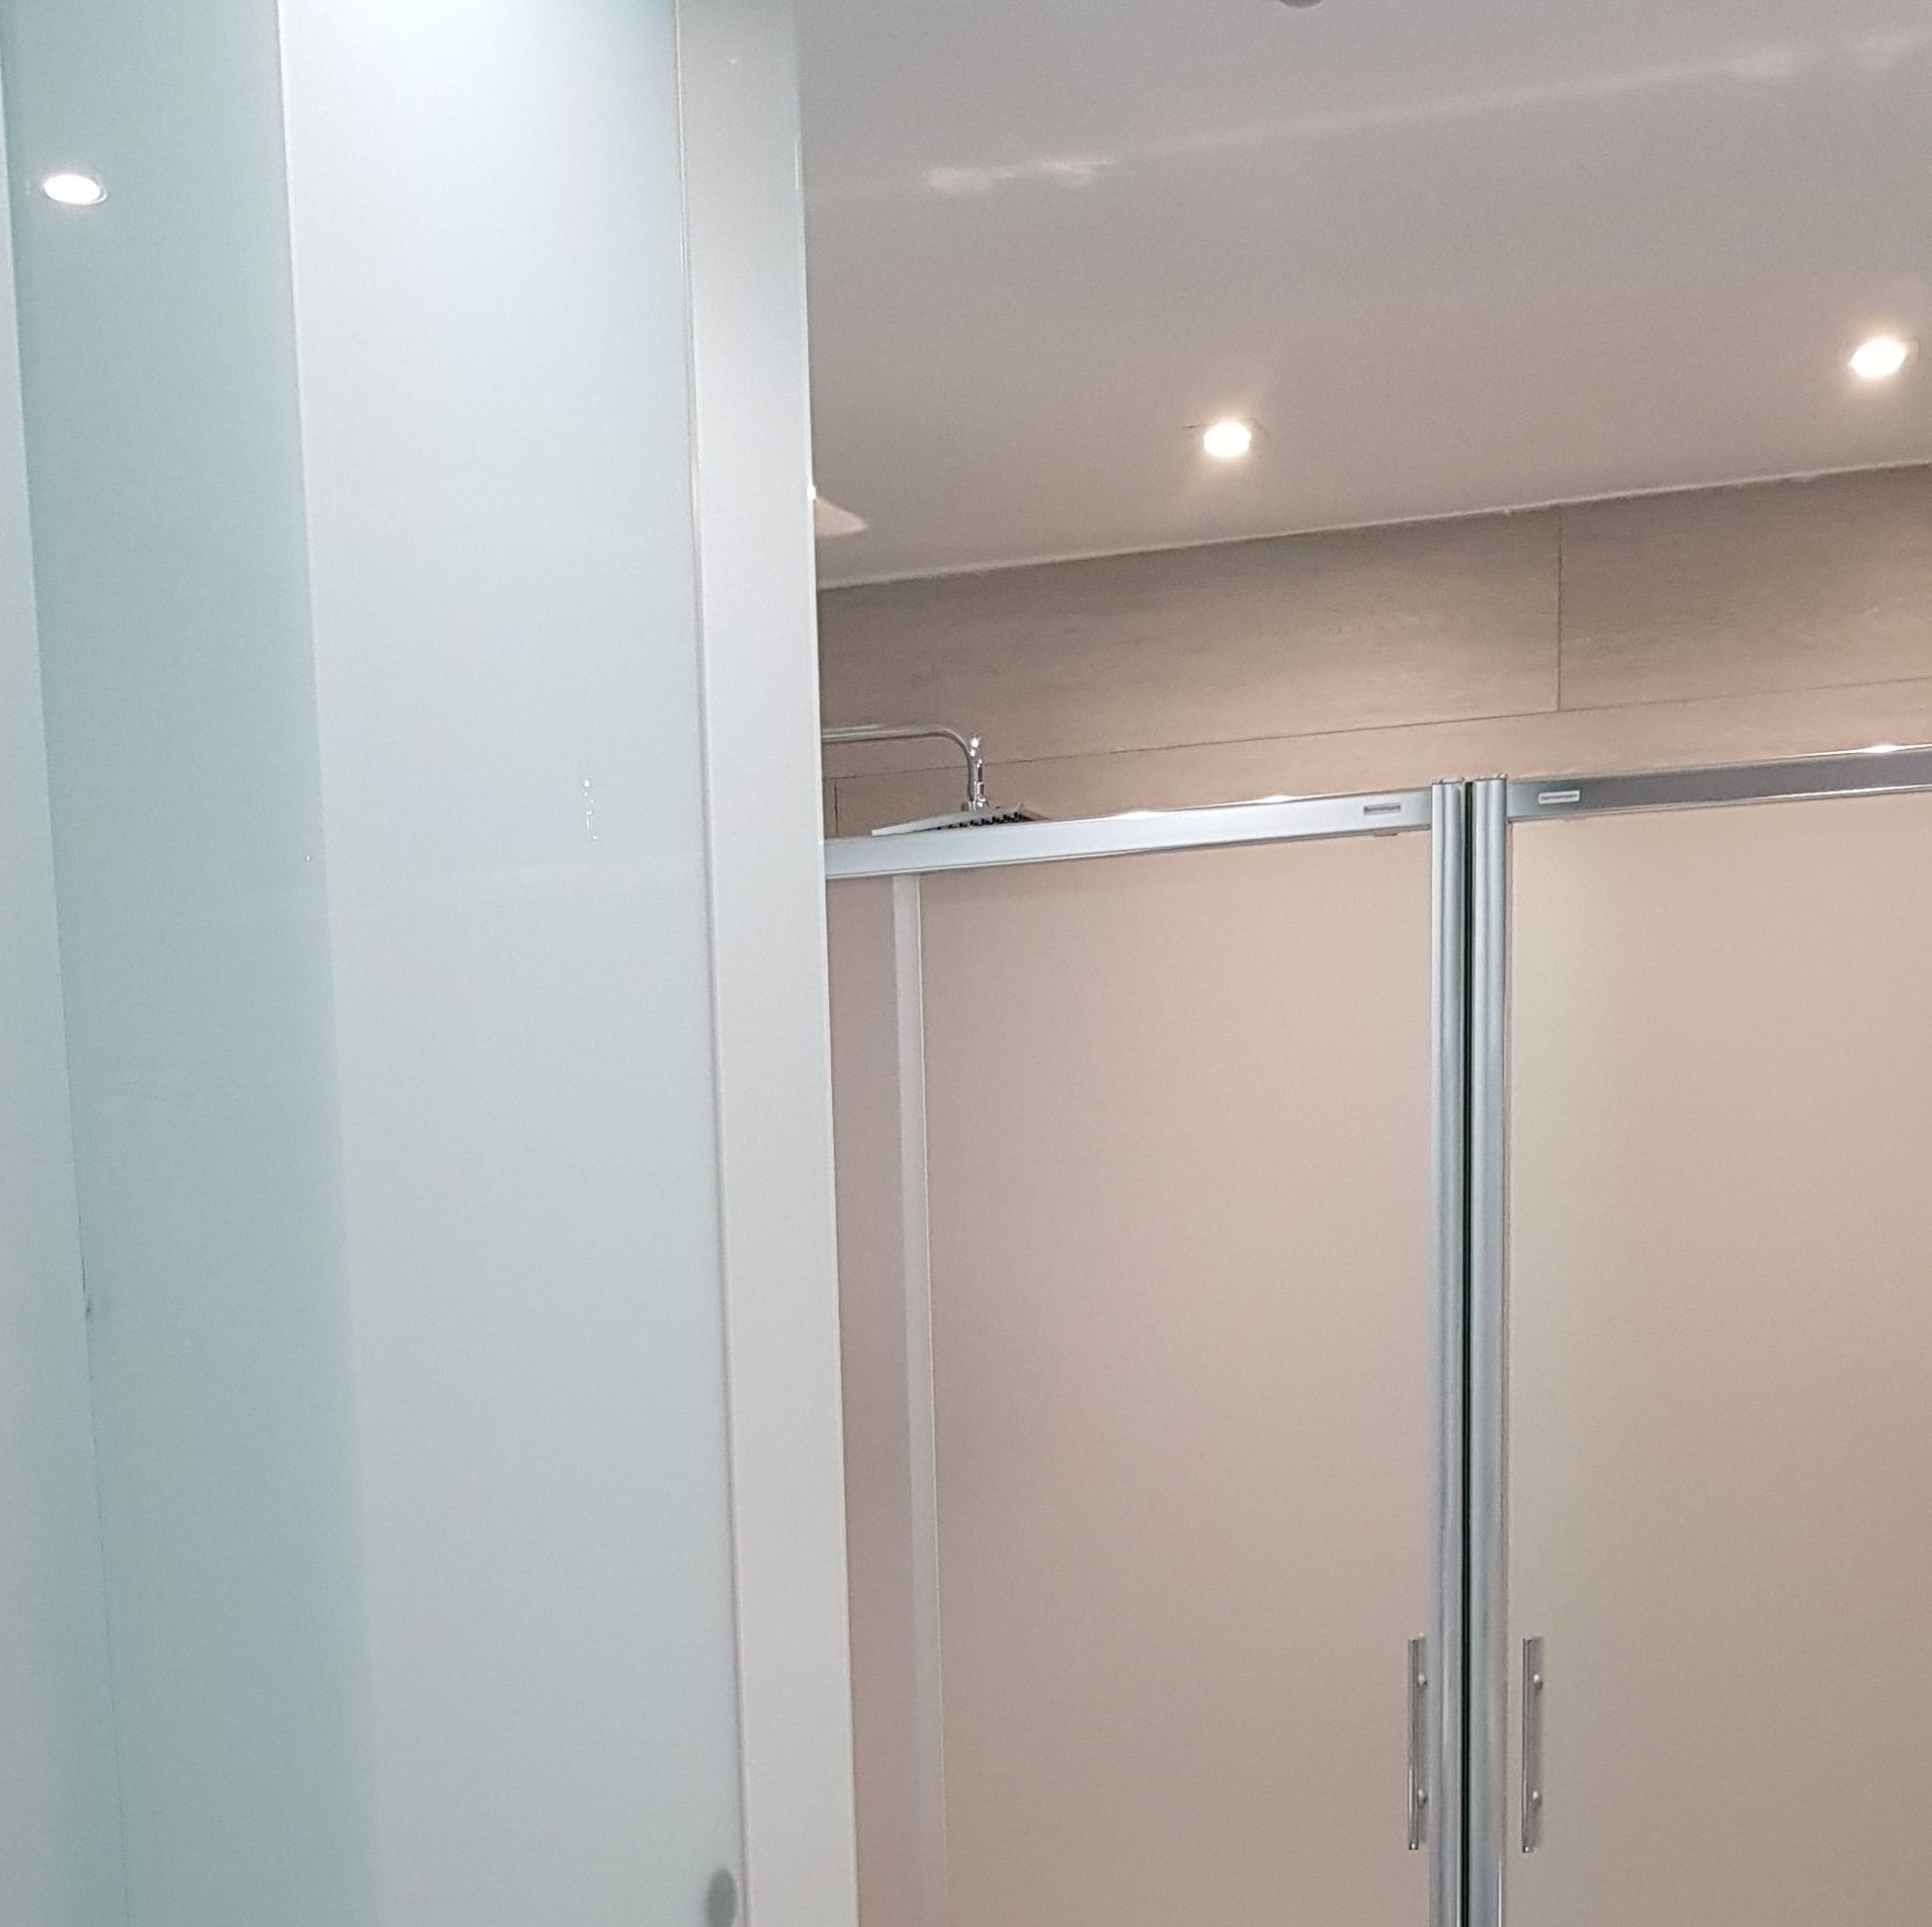 cristaleria-formas-cabina-cristal-inodoro- o ducha